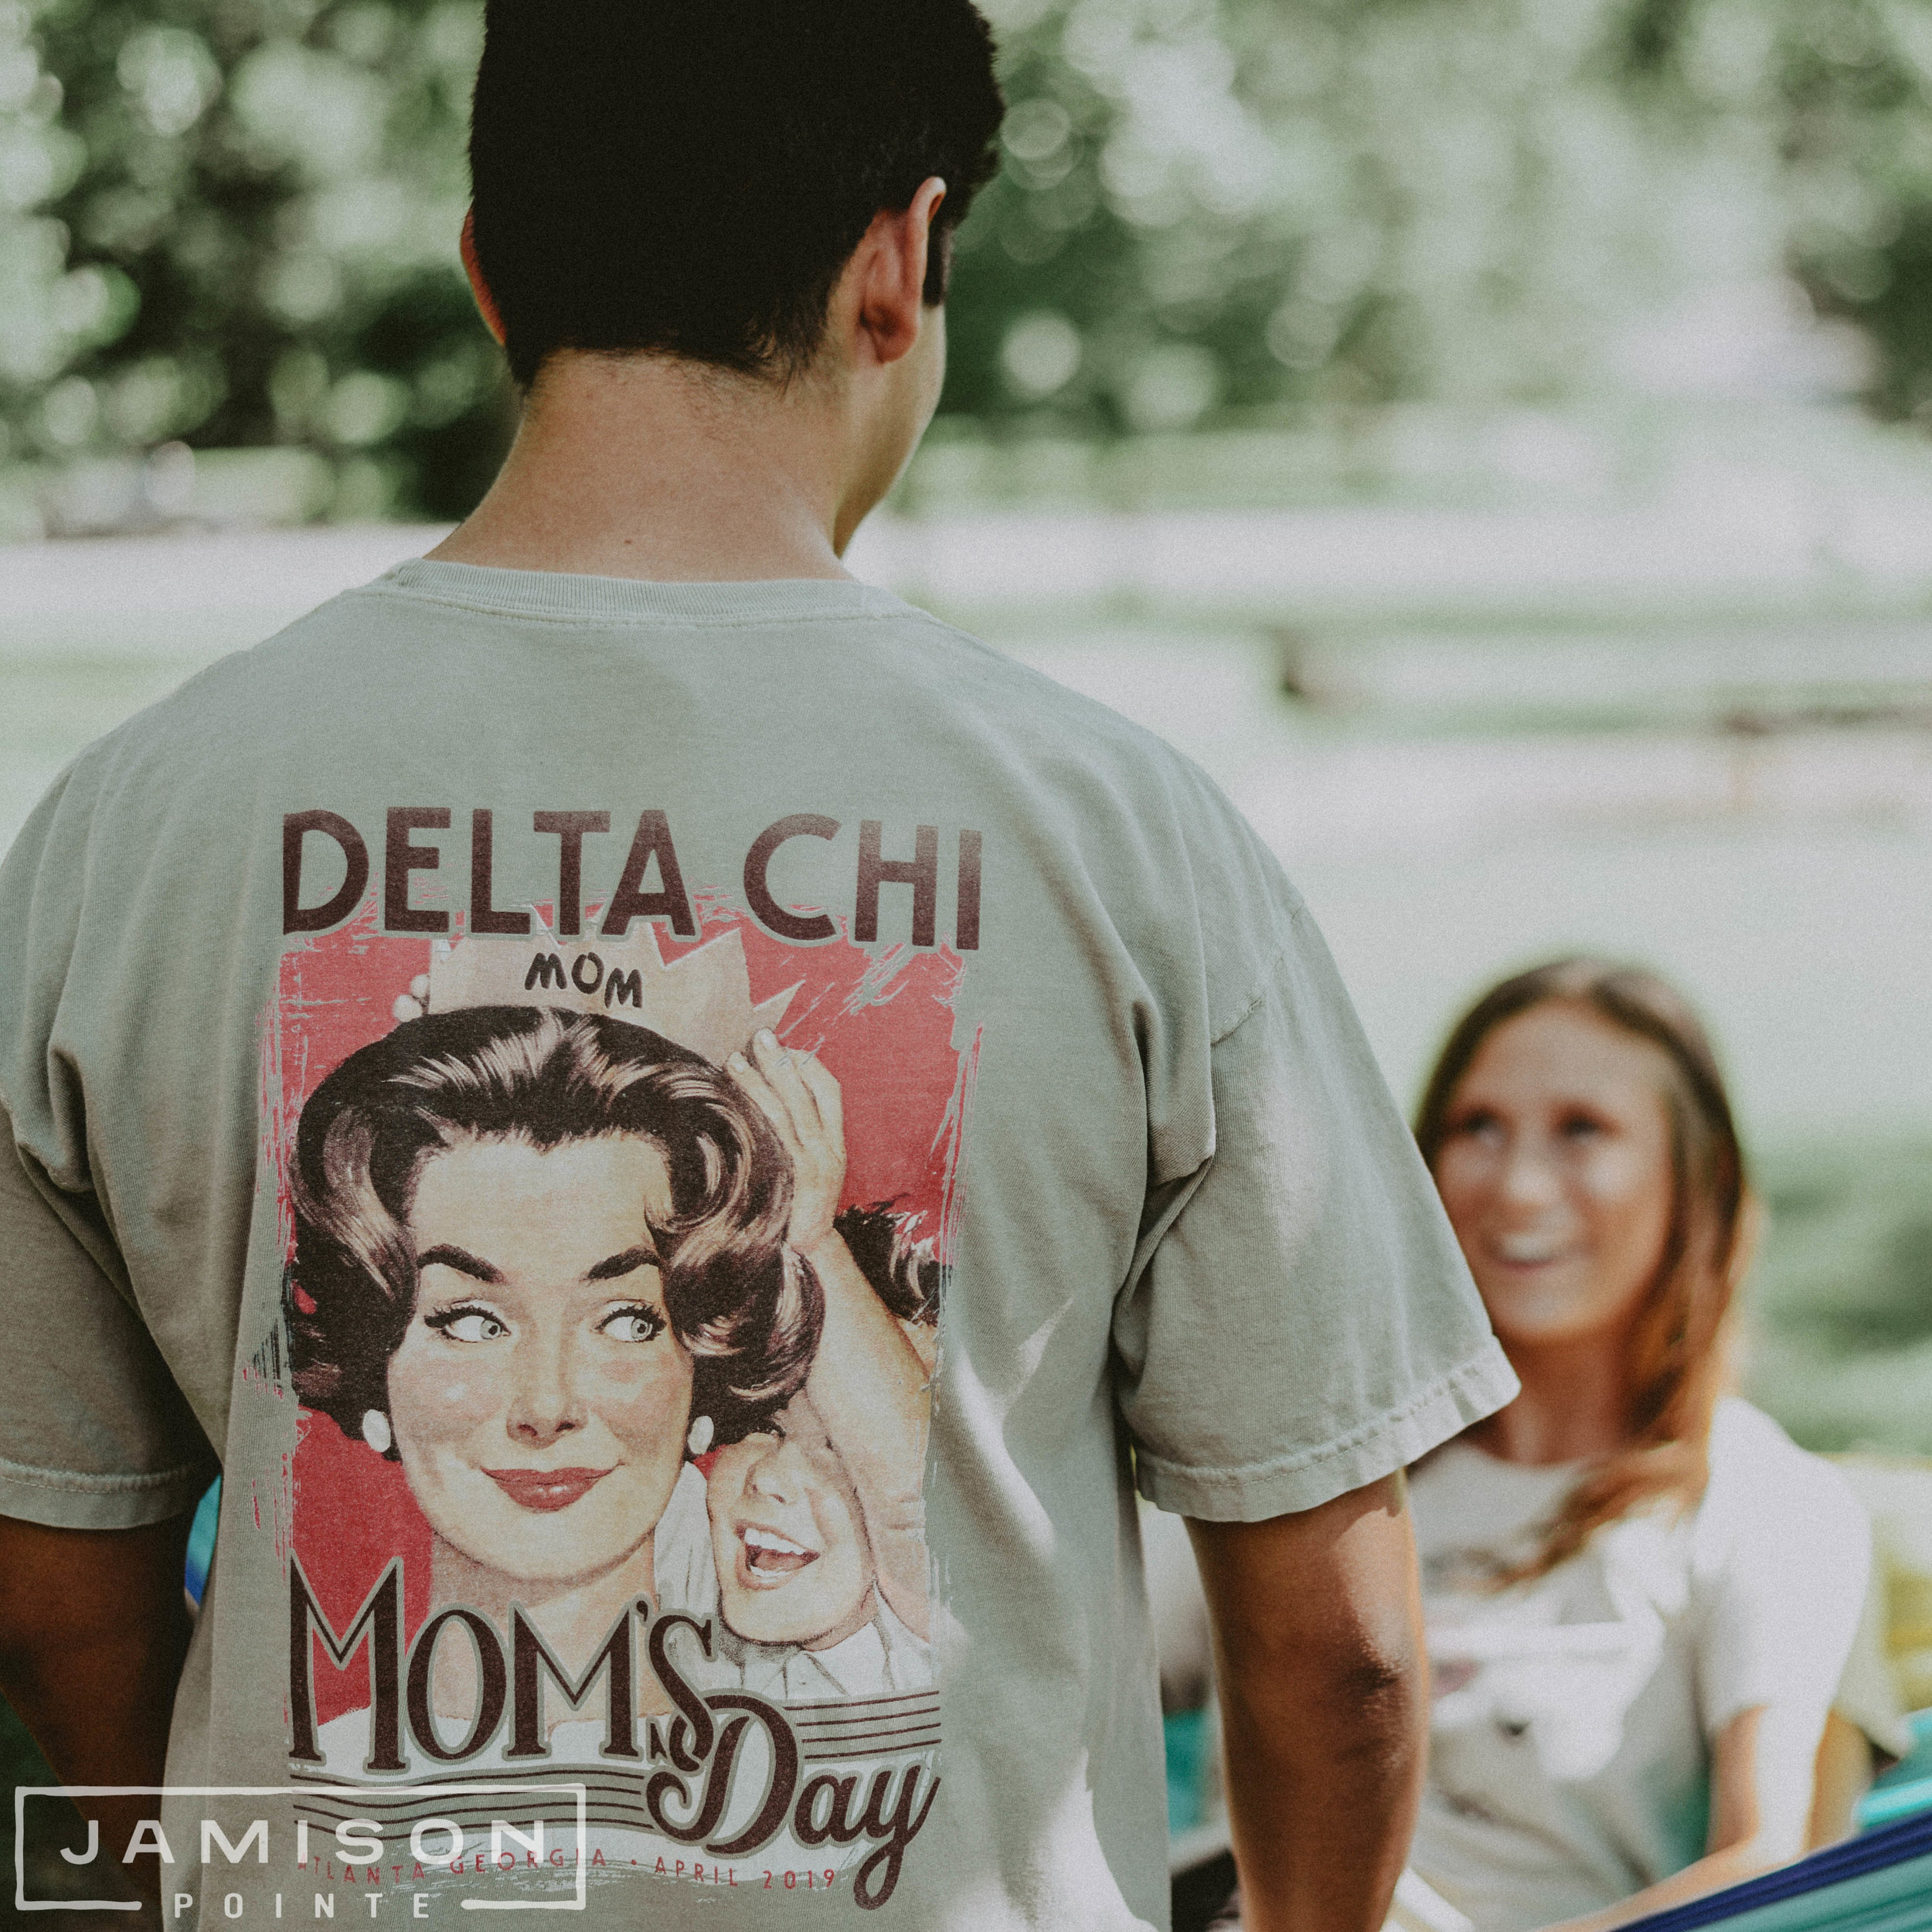 Delta Chi Moms Day Tee